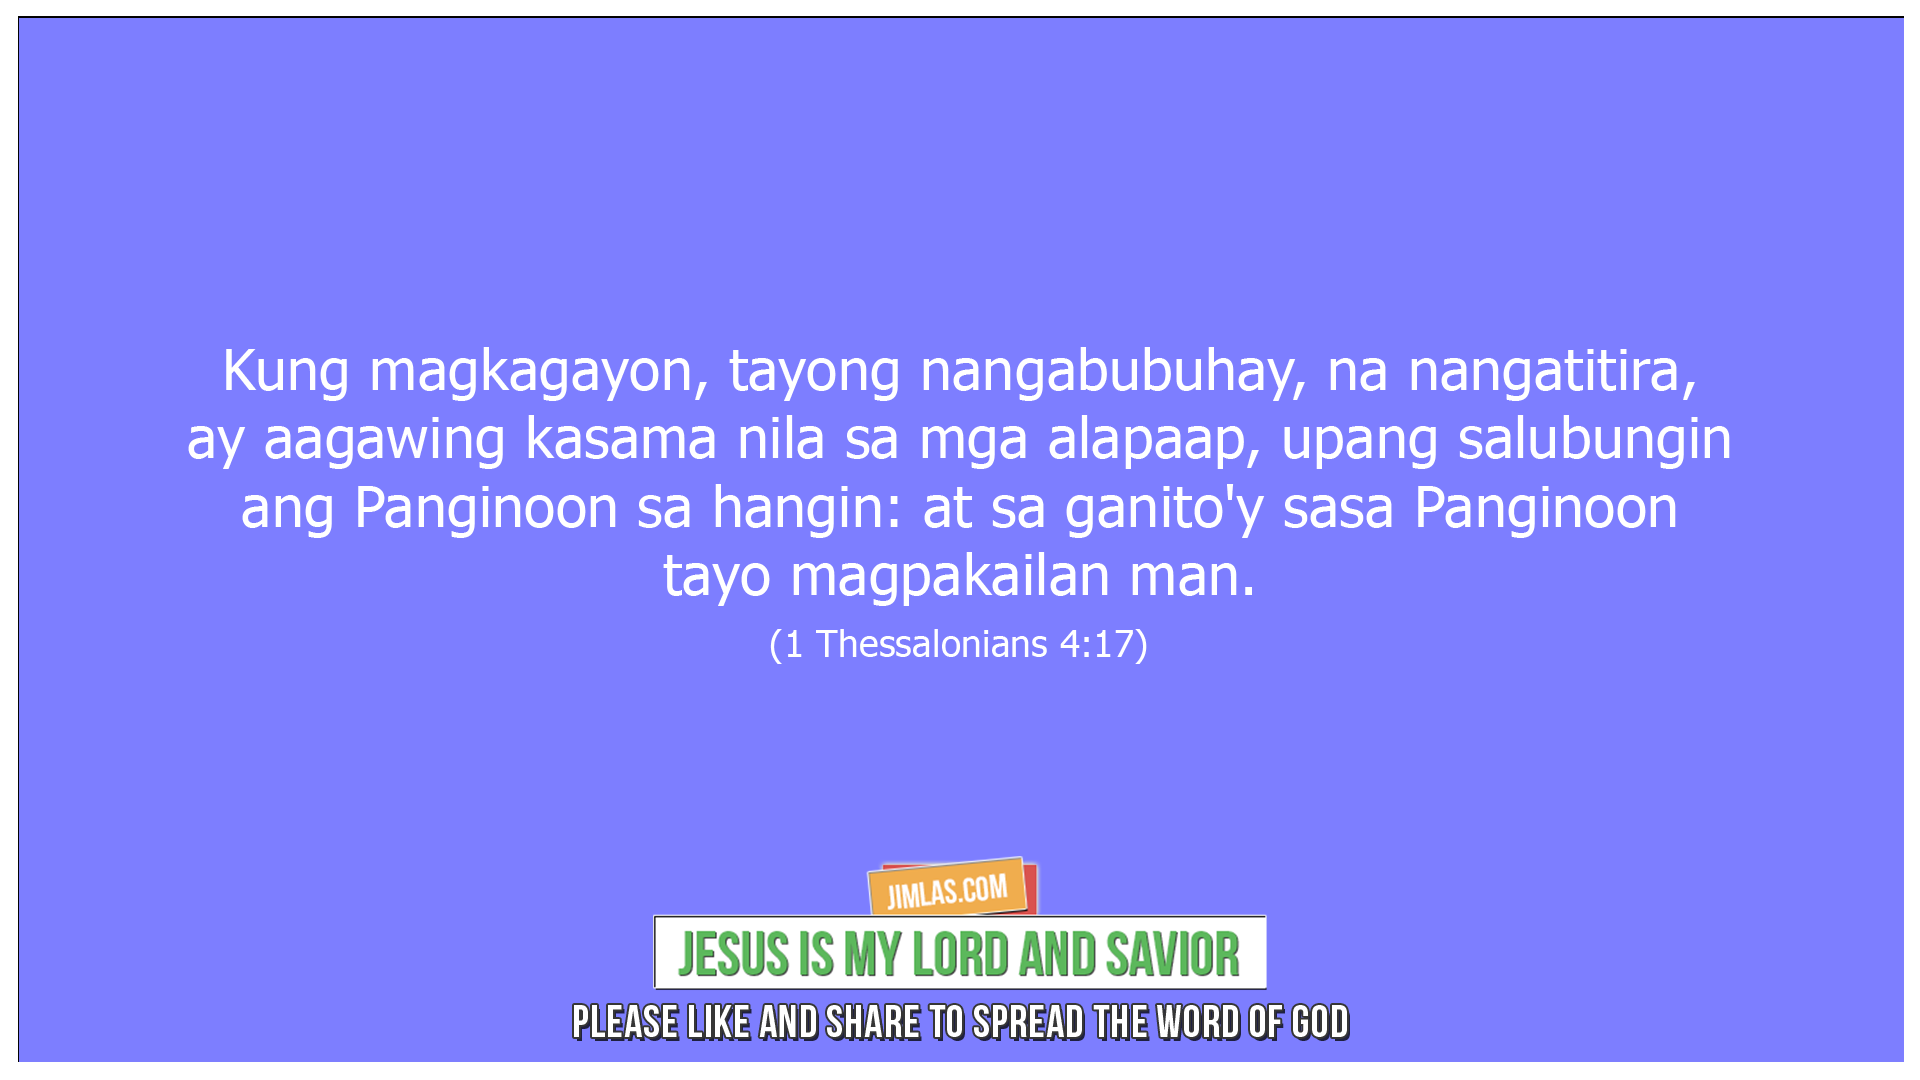 1 Thessalonians 4 17, 1 Thessalonians 4:17